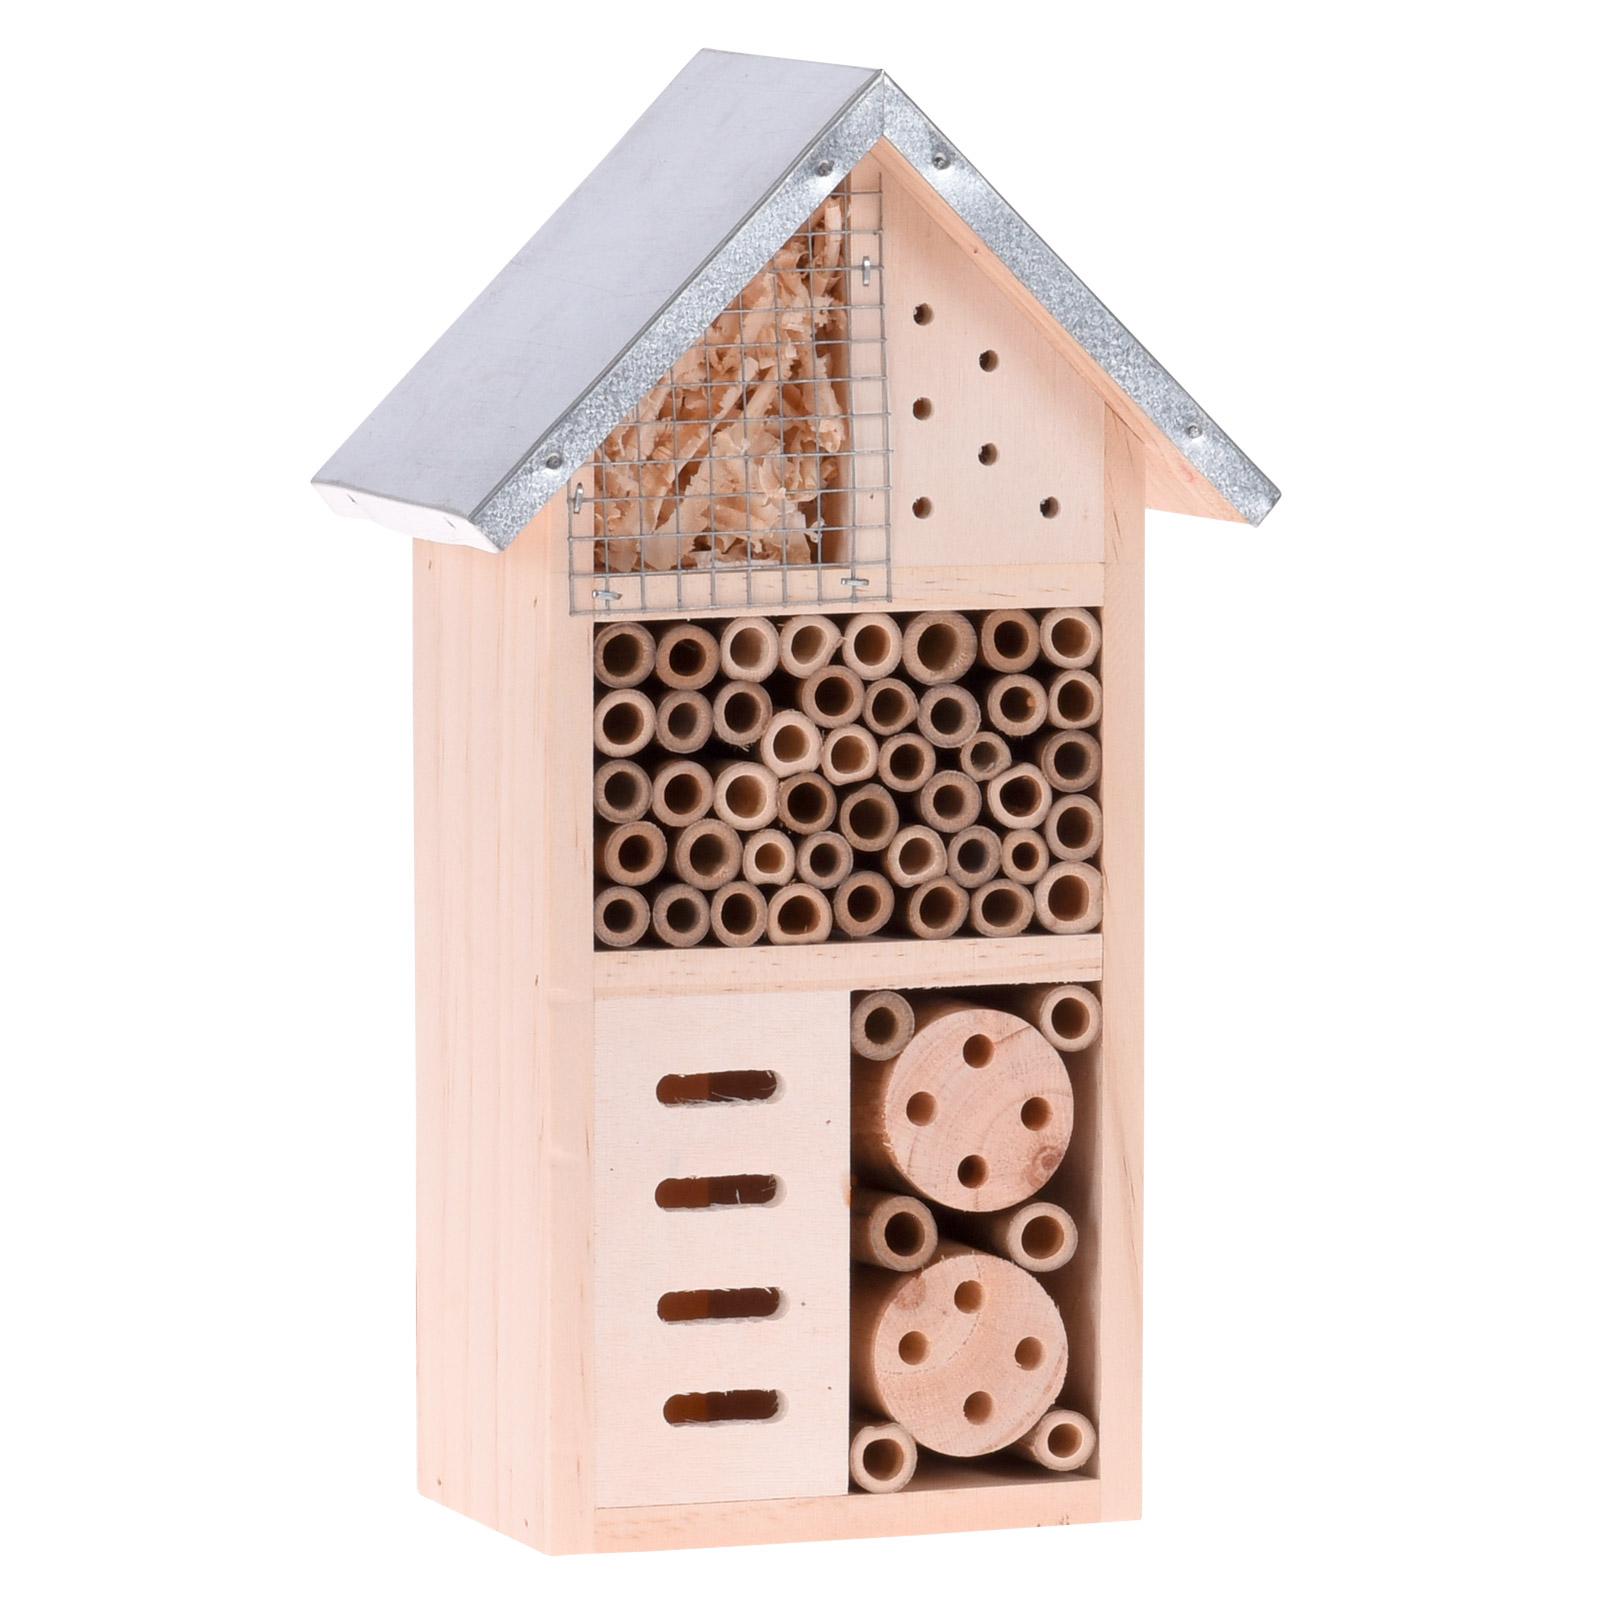 stabilo Insektenhotel Insektenhaus Insekten m. Metalldach 15x9x26 20259